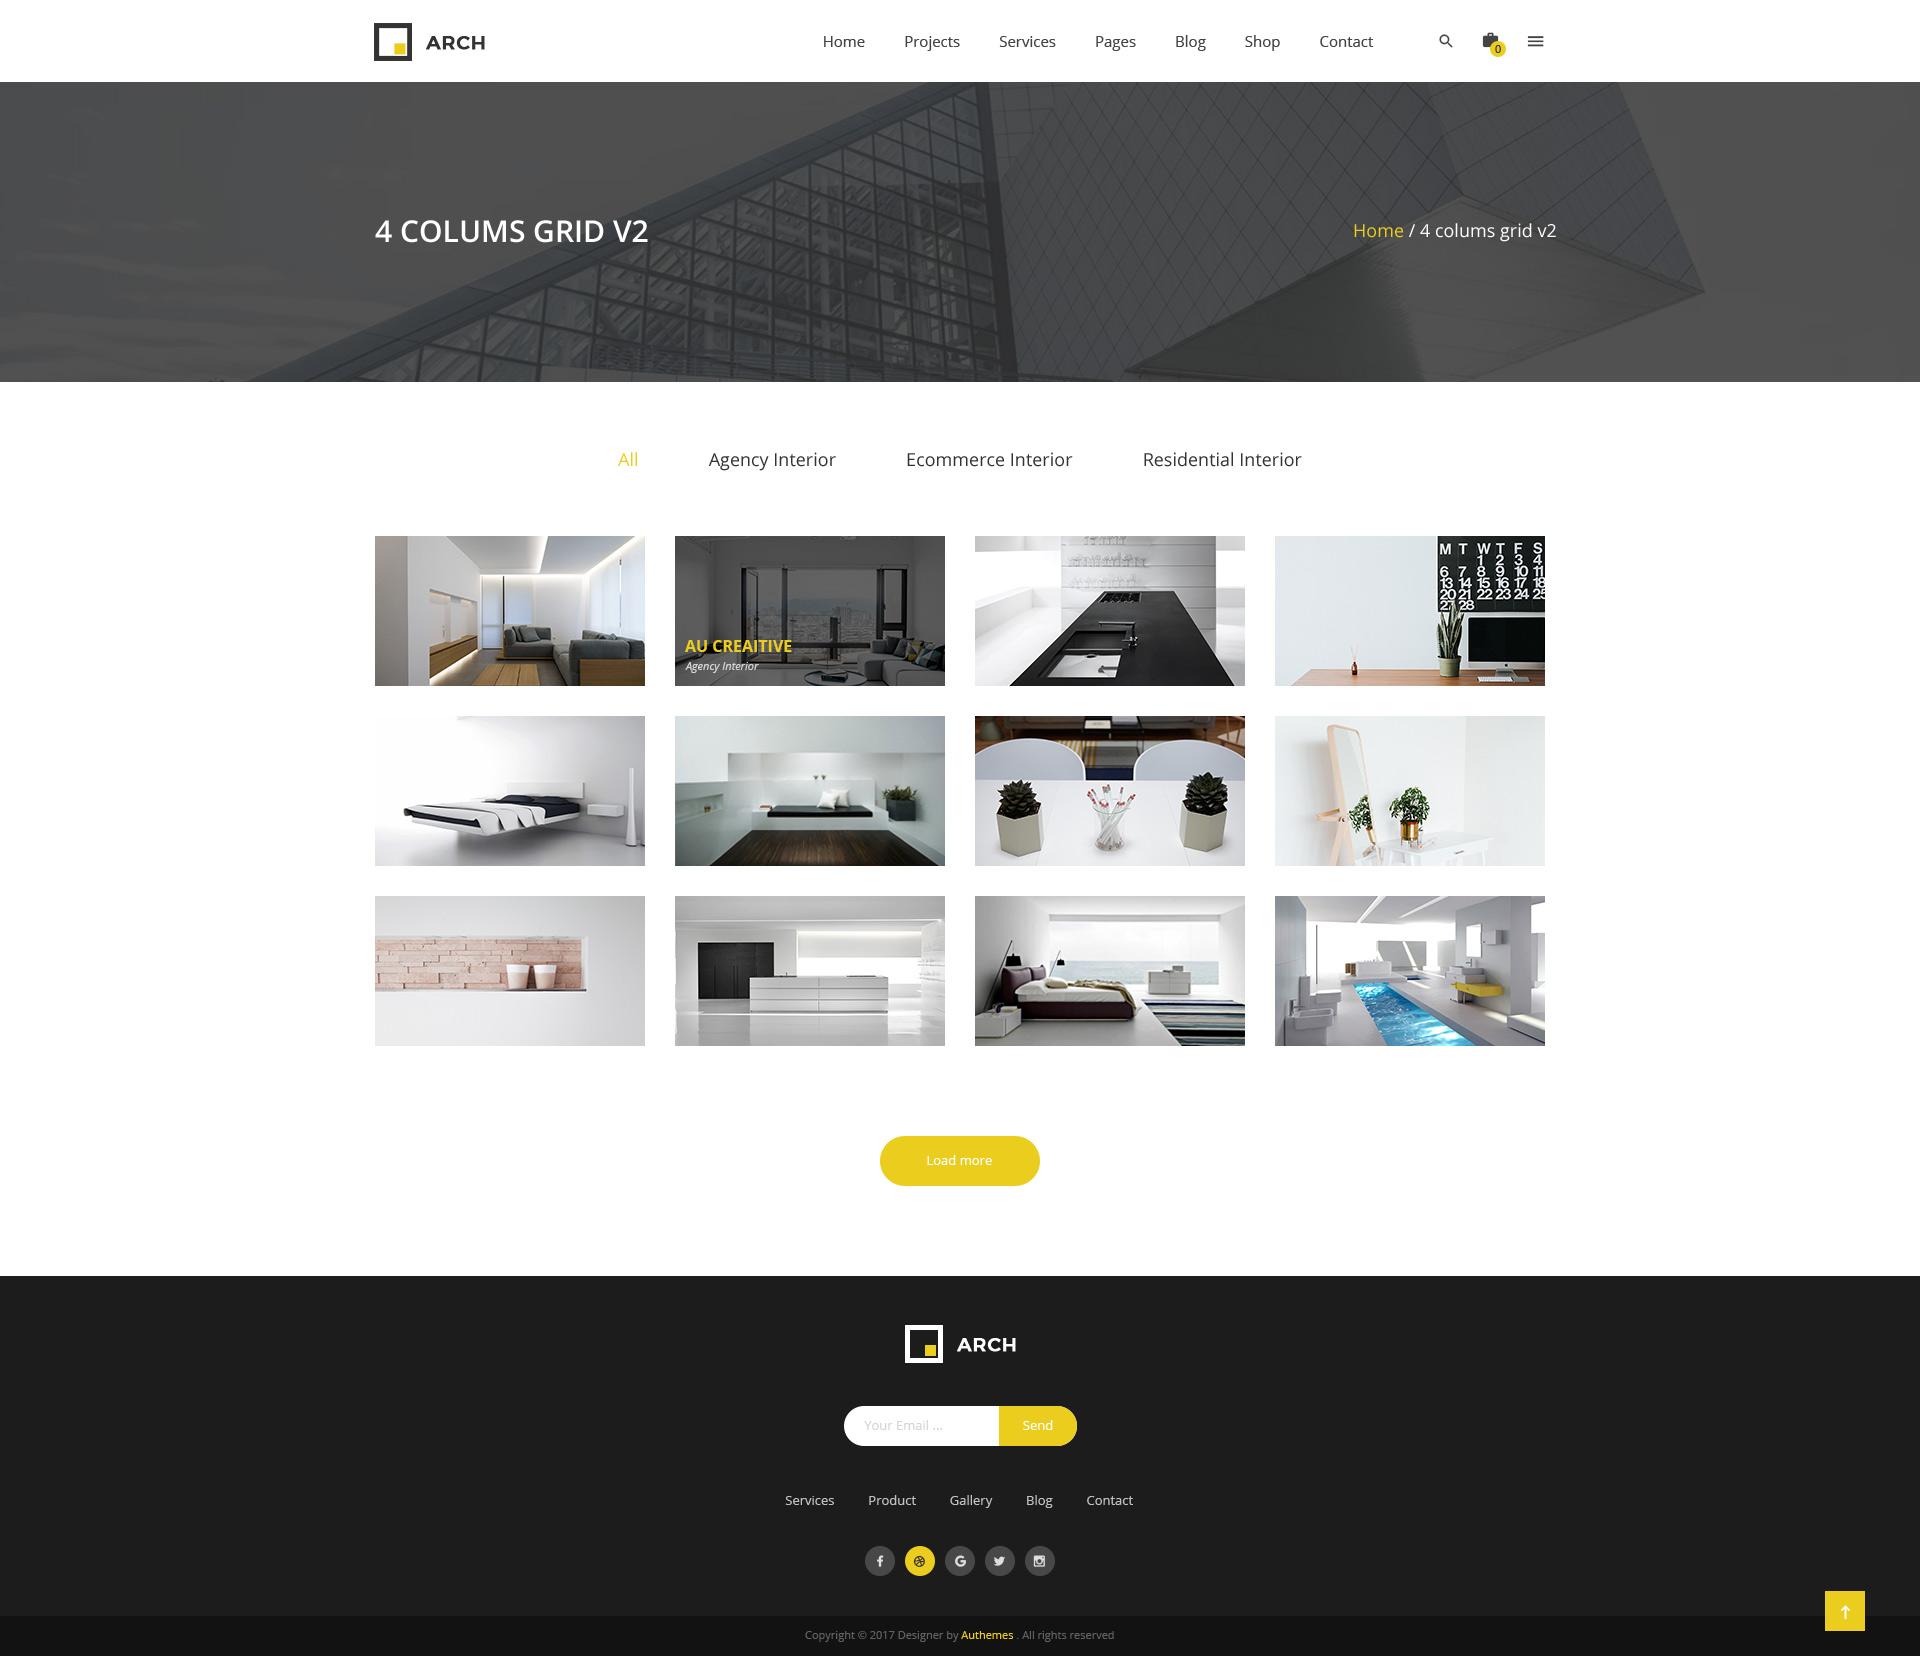 Arch Decor - Interior Design, Architecture and Building Business PSD ...